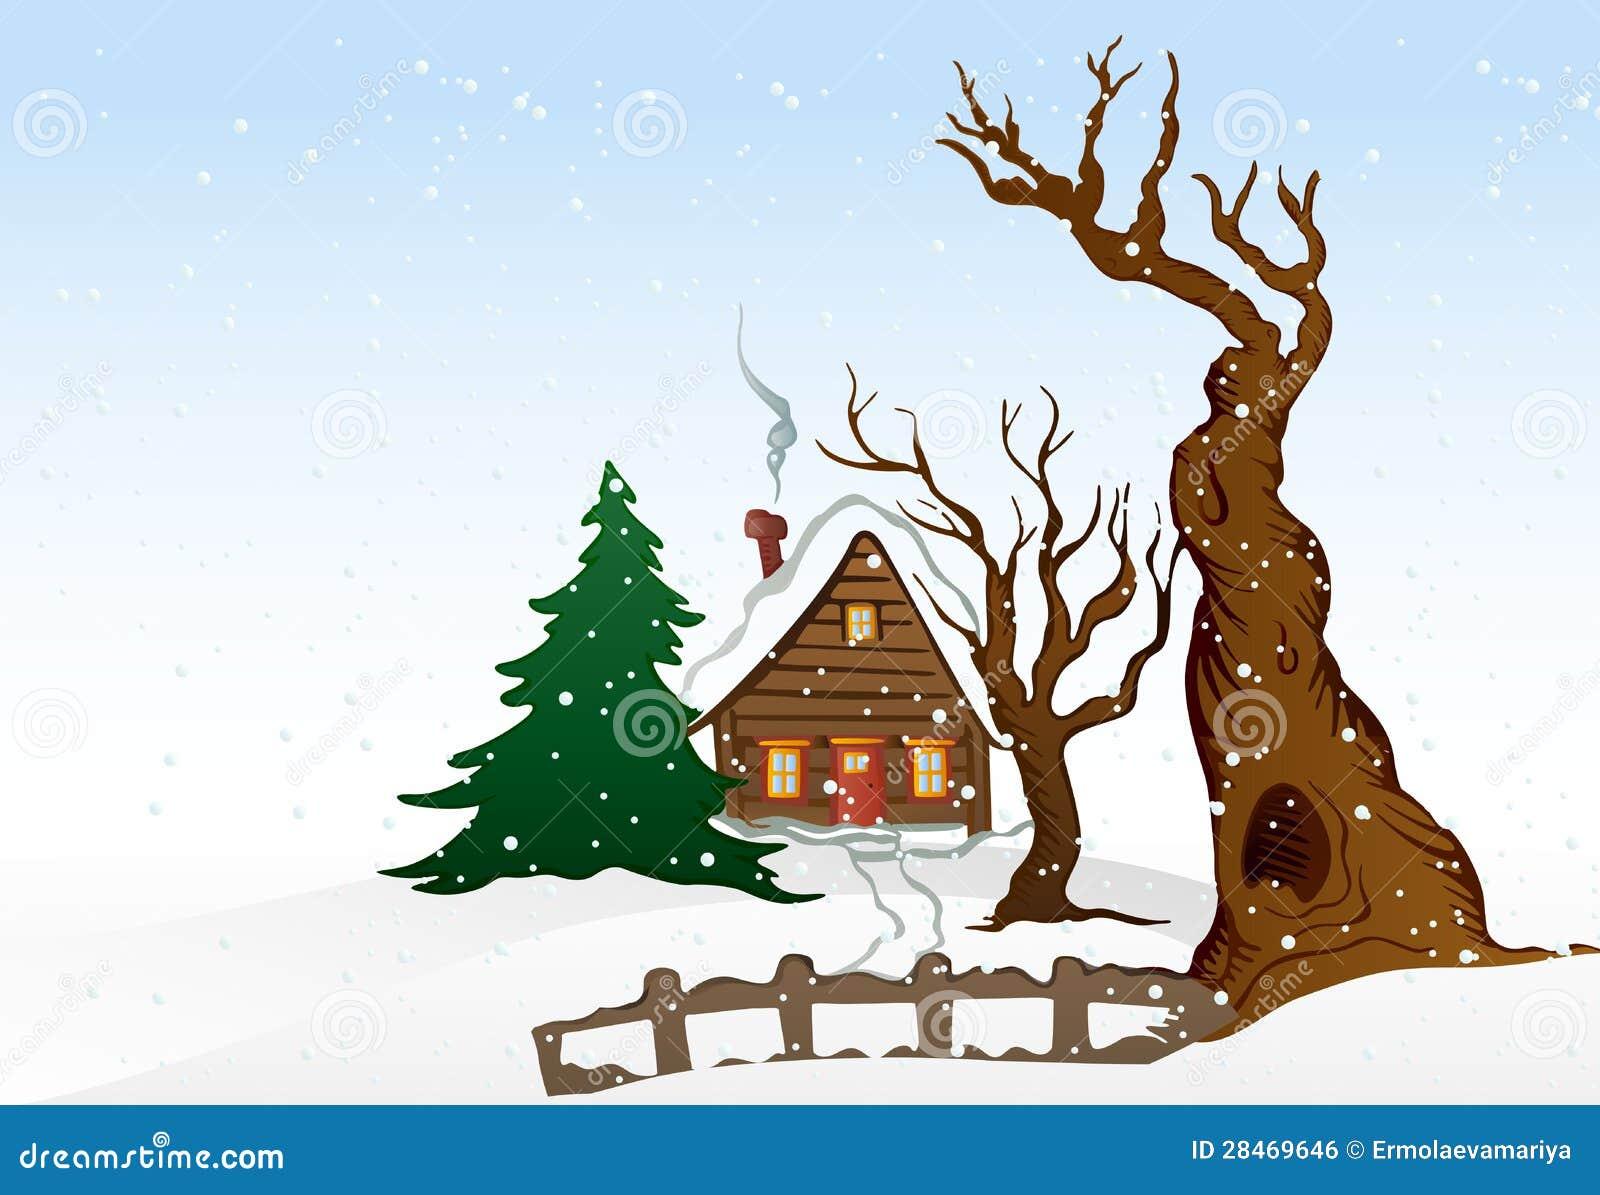 Cartoon winter houses on white background - vector illustration.